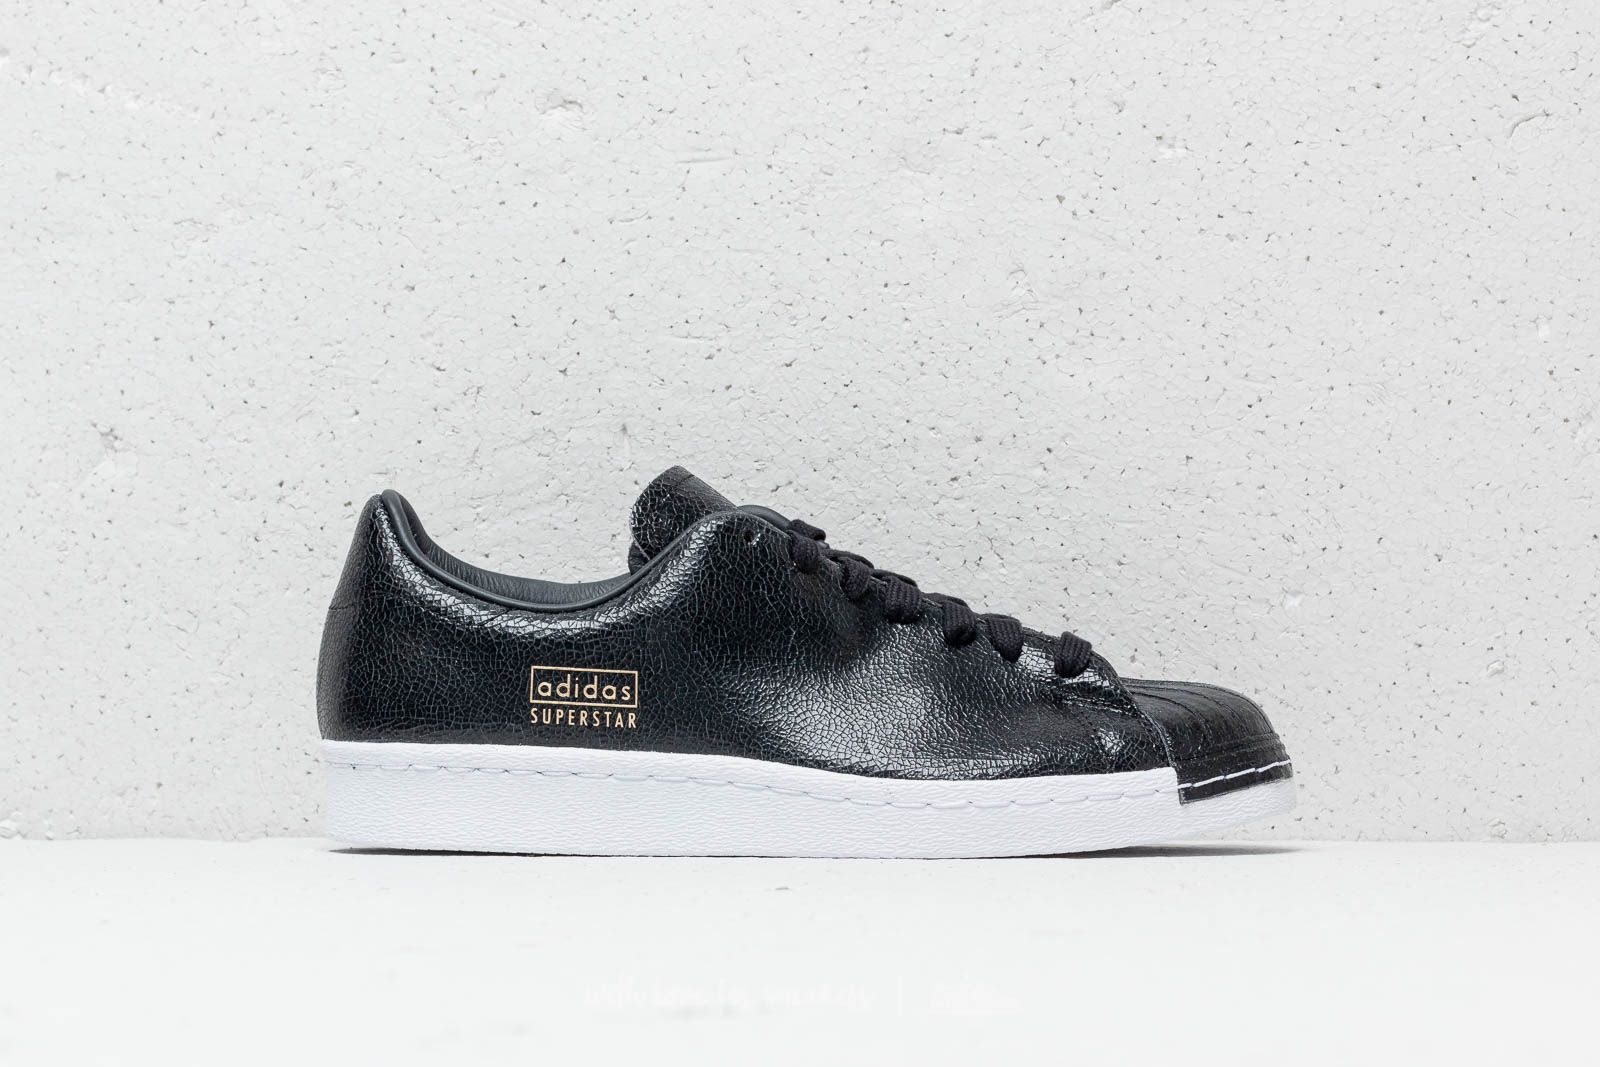 Core 80s Clean Ftw Adidas Superstar Black WhiteFootshop odCxeB